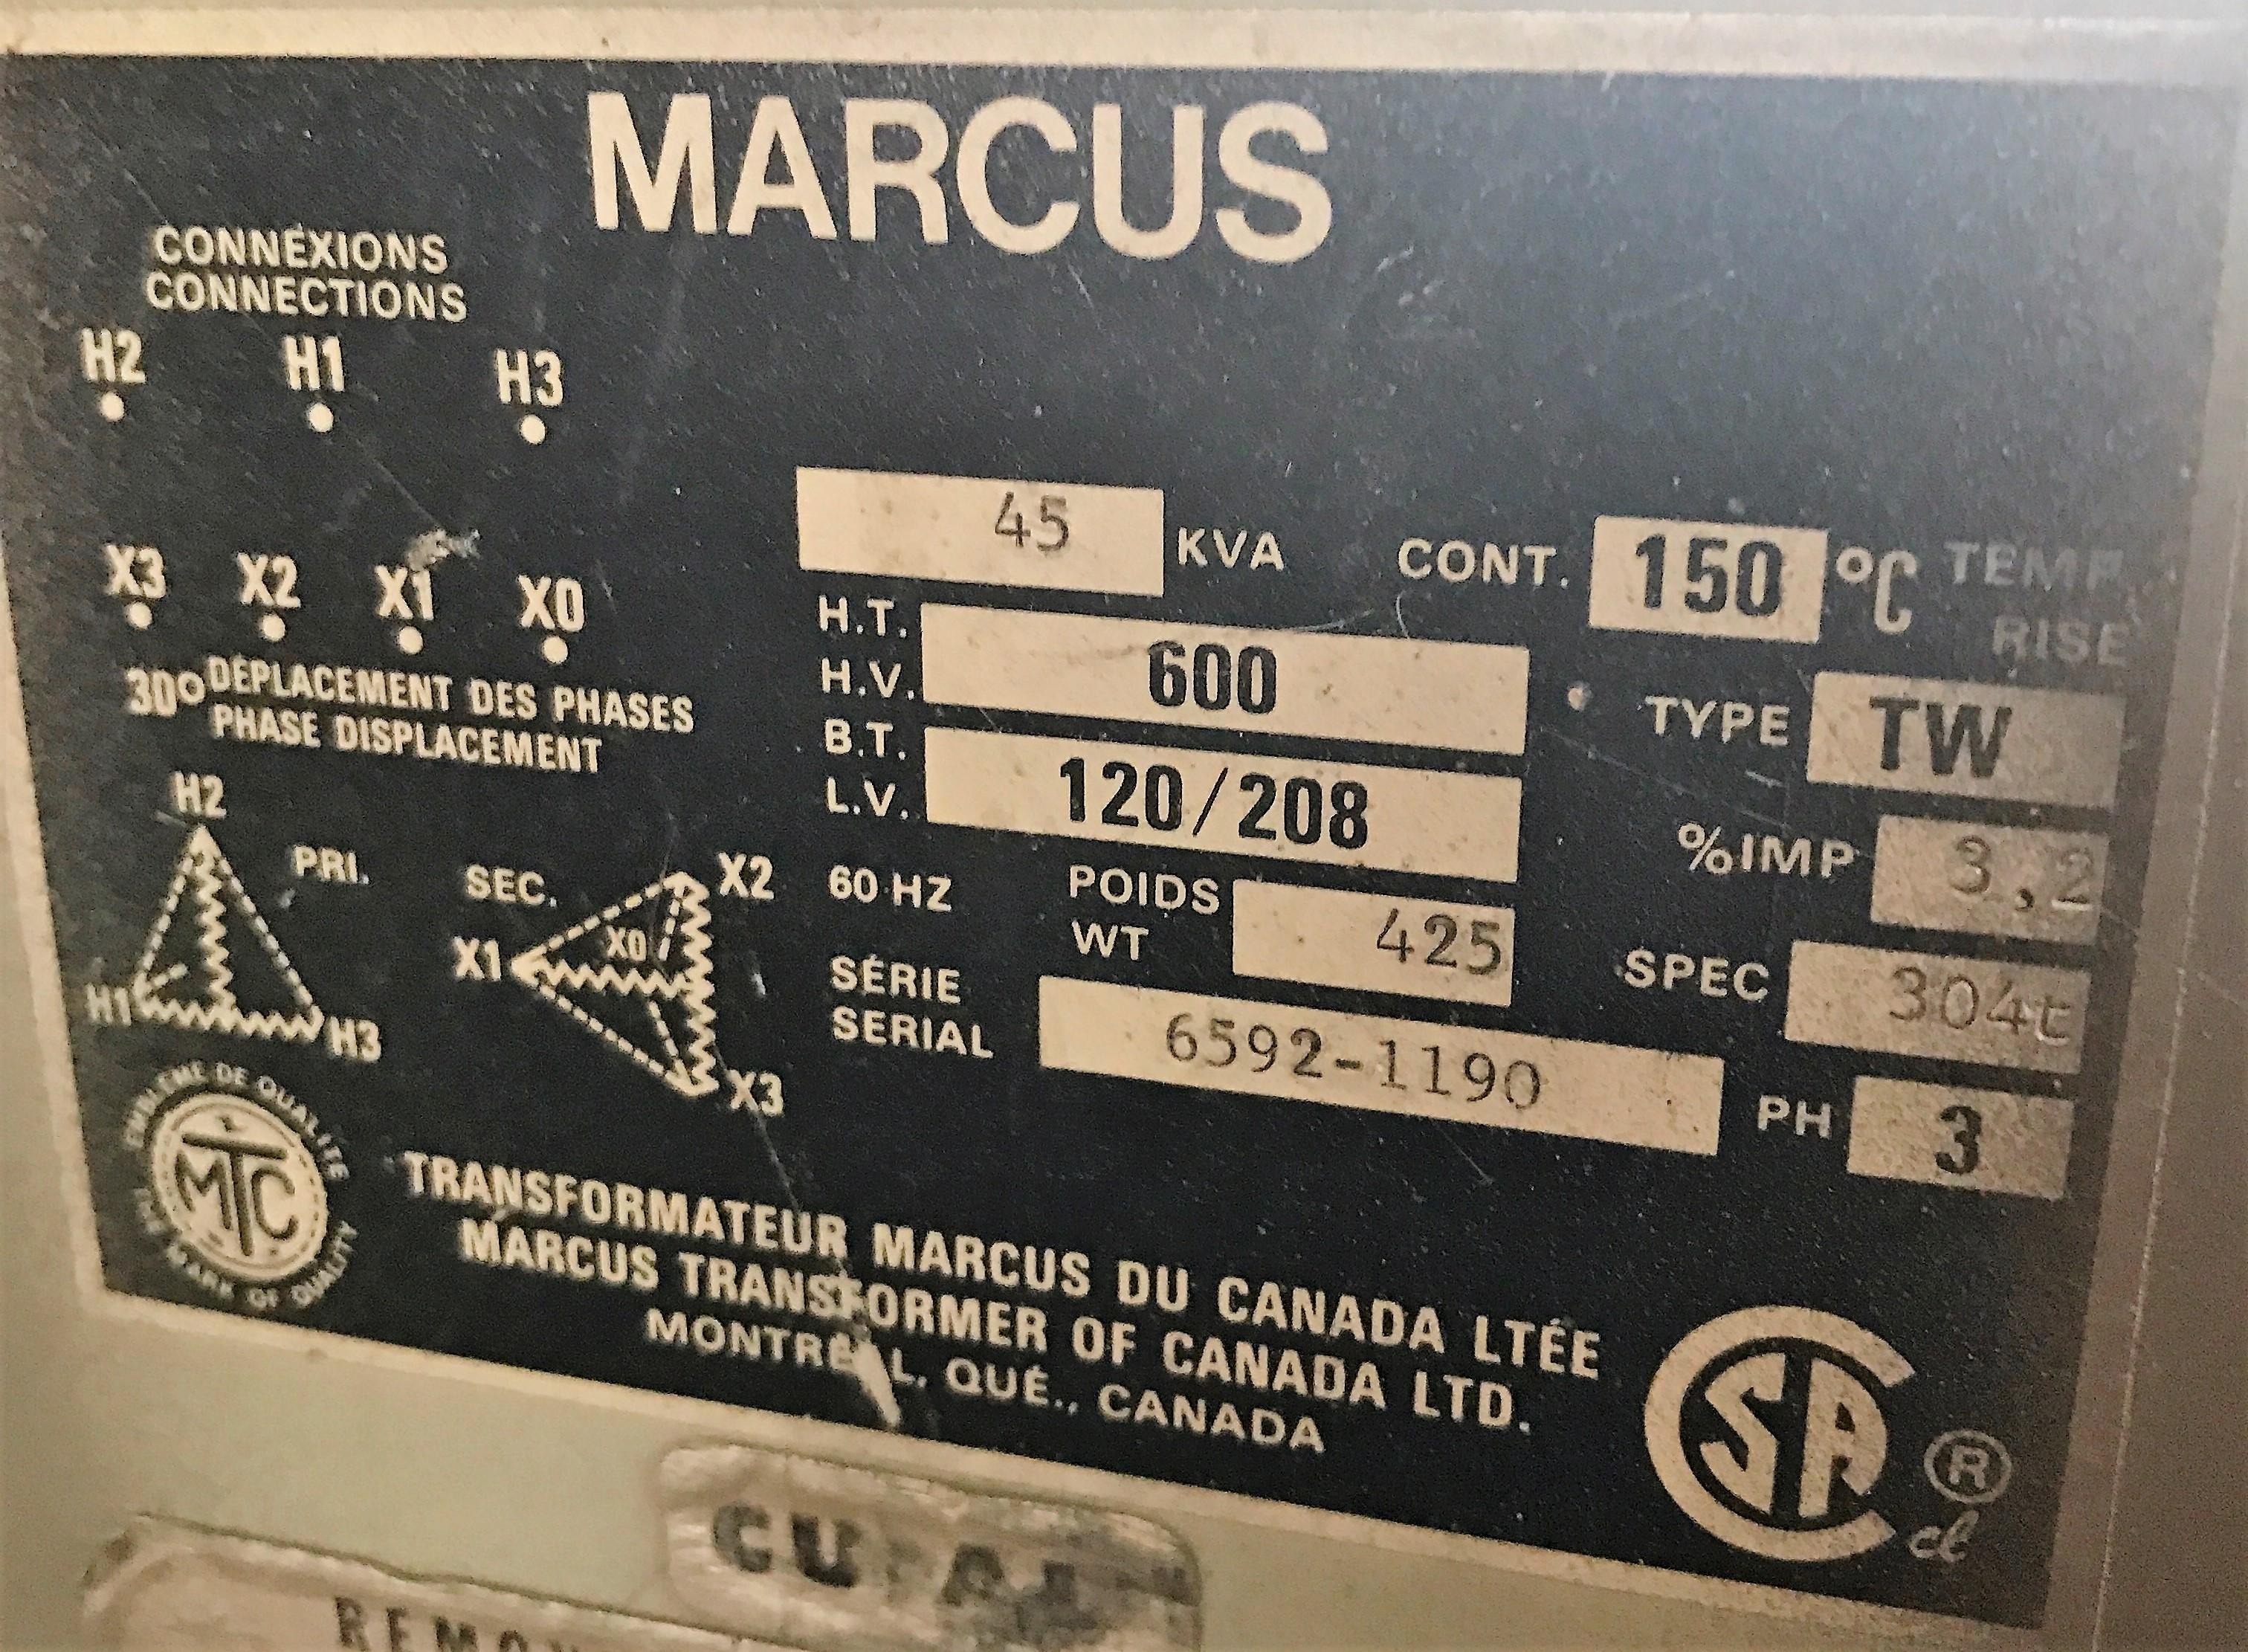 Lot 49 - MARCUS 45KVA 600V PRIMARY 120/208V SECONDARY ISOLATION TRANSFORMER